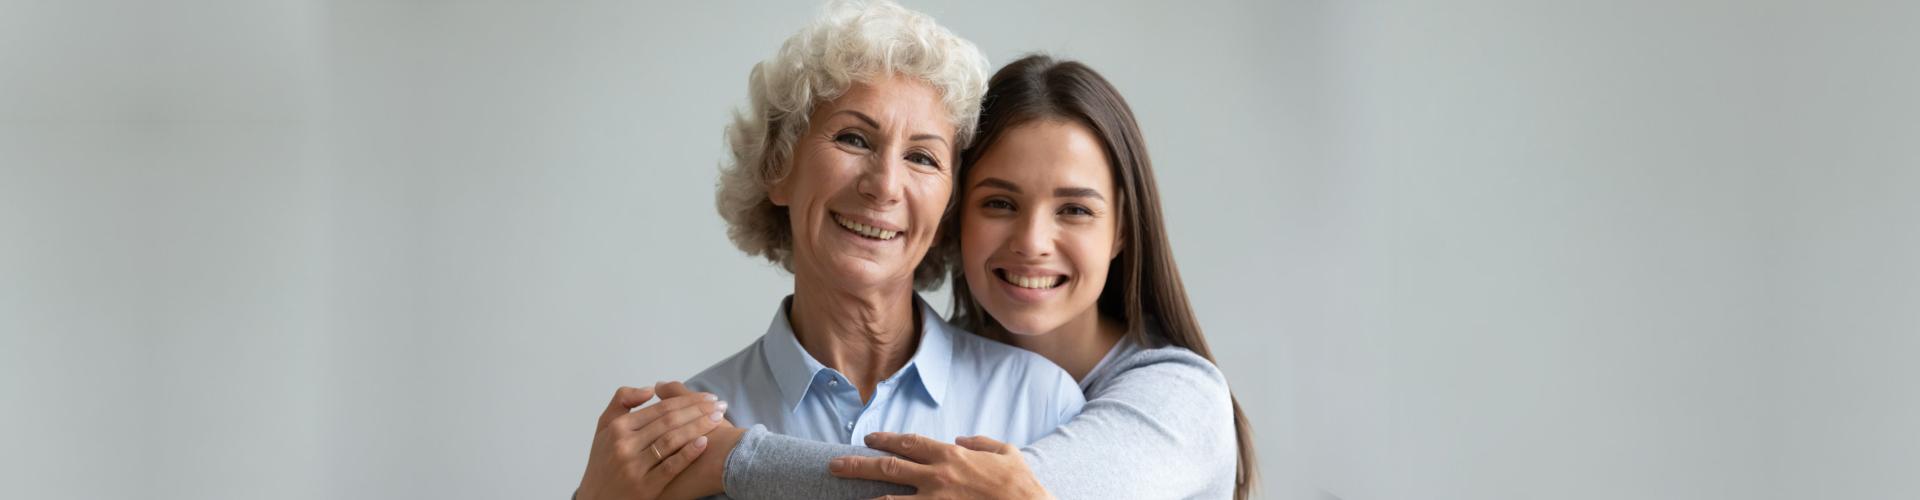 female caregiver hugging senior woman while smiling